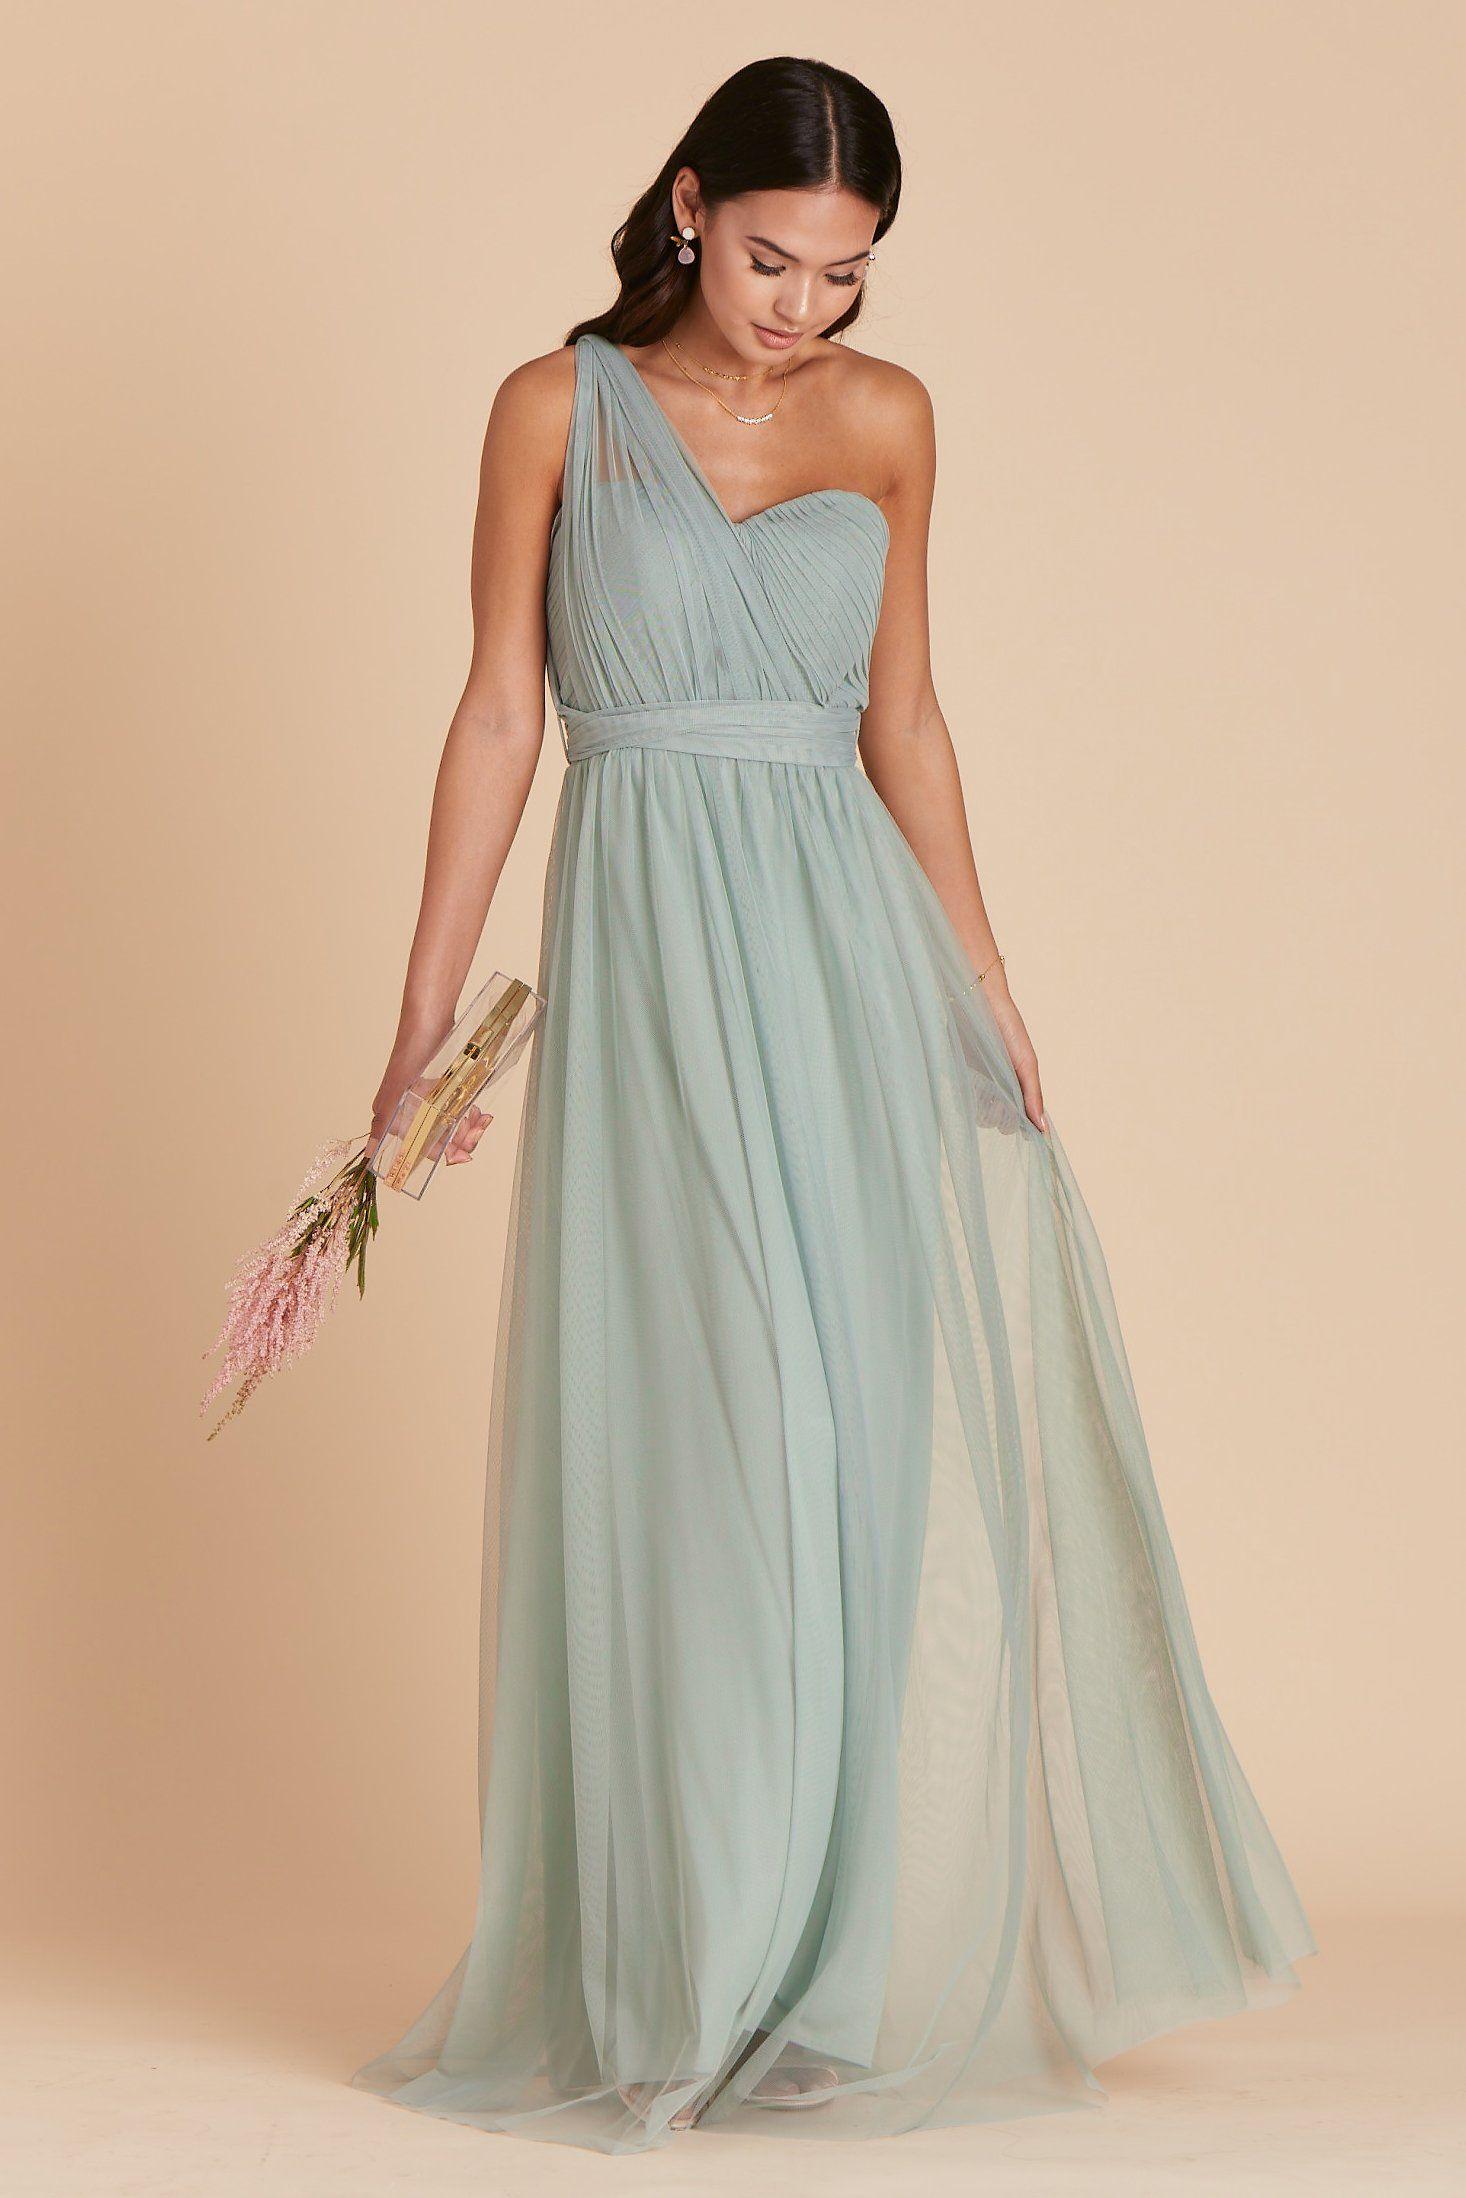 Christina convertible dress sage sage green bridesmaid